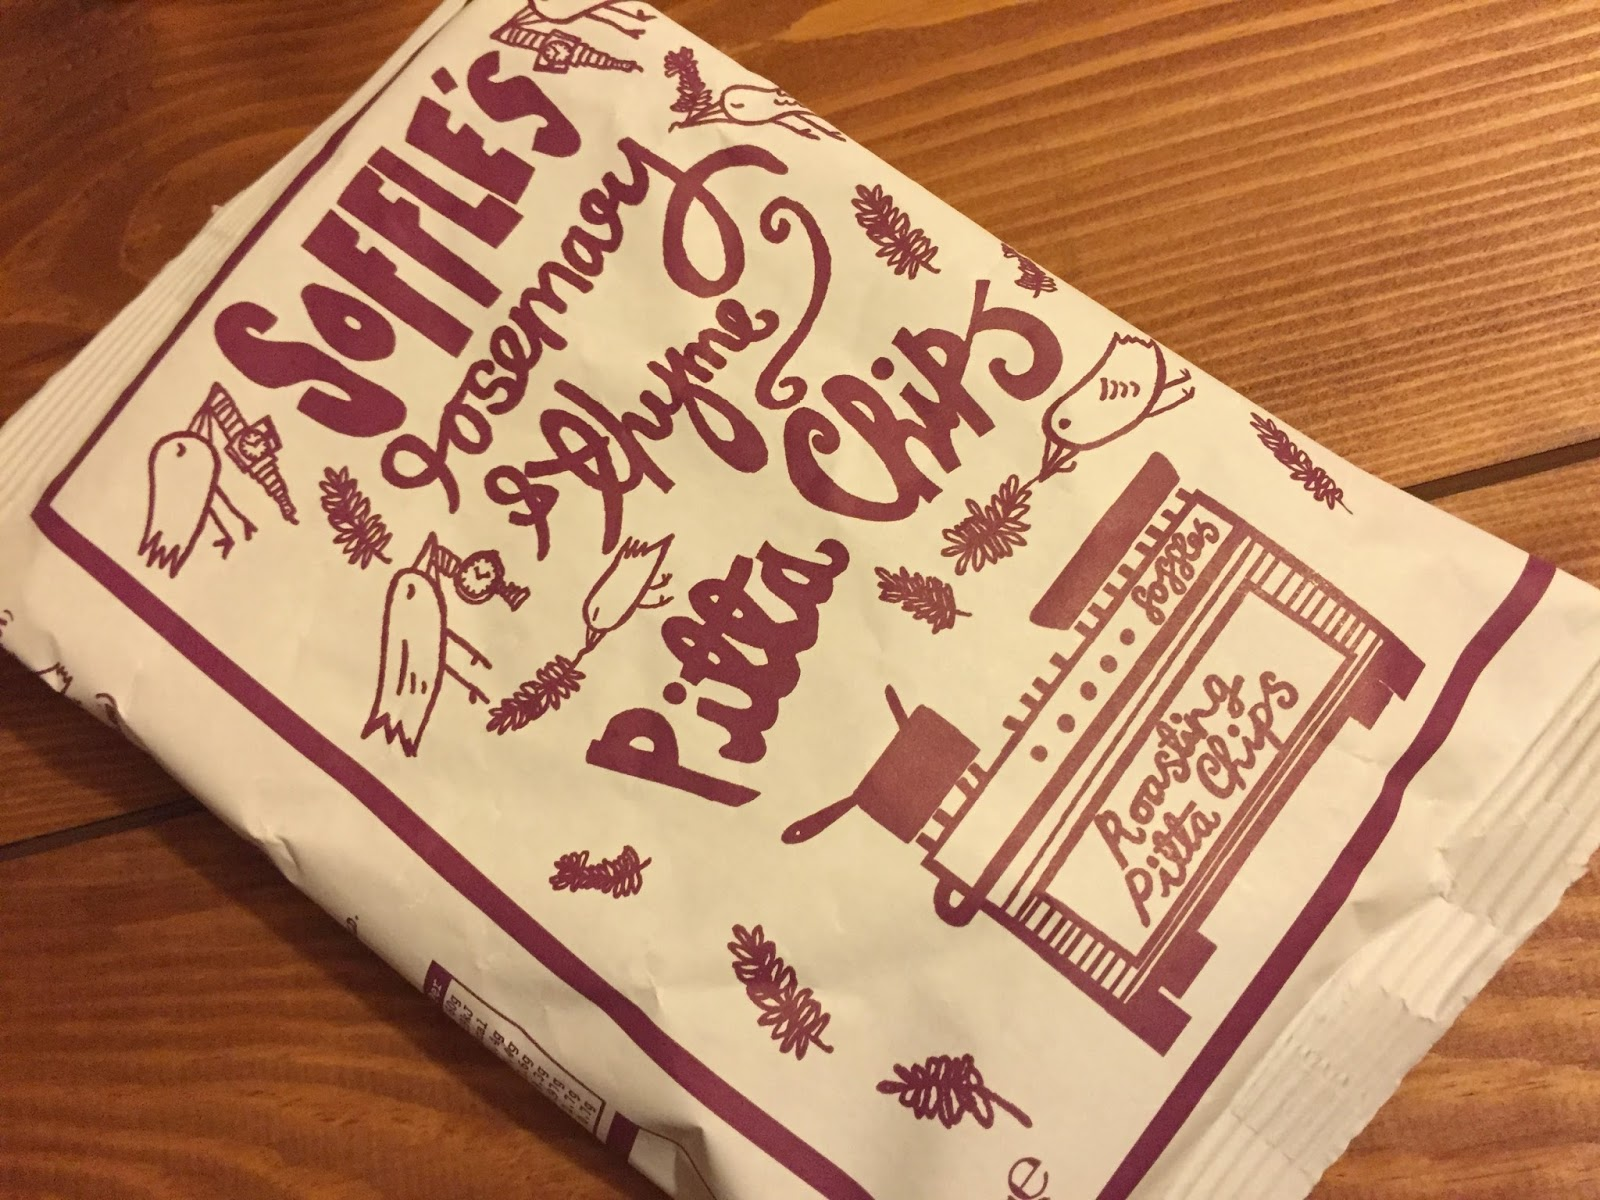 Soffles Rosemary & Thyme Pitta Chips